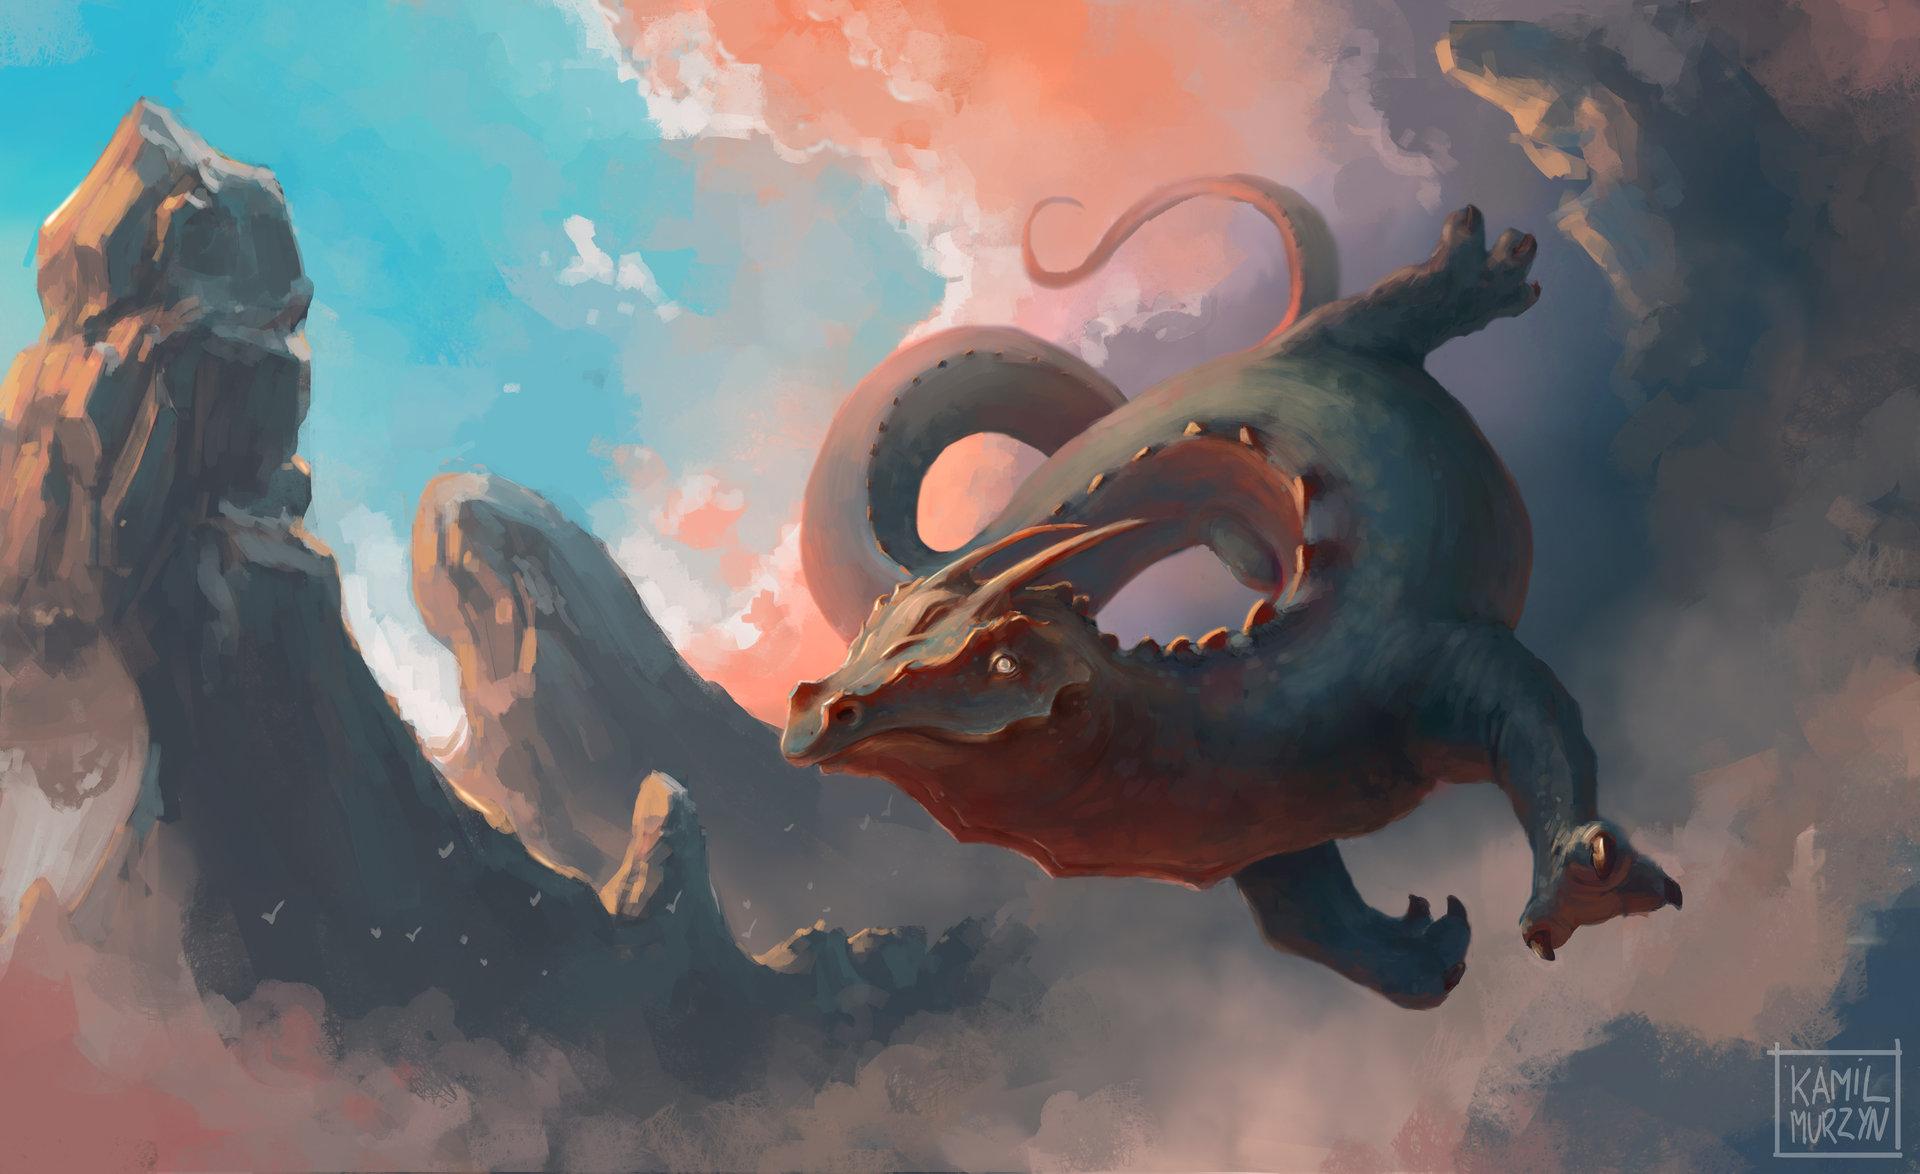 Kamil murzyn dragon2000